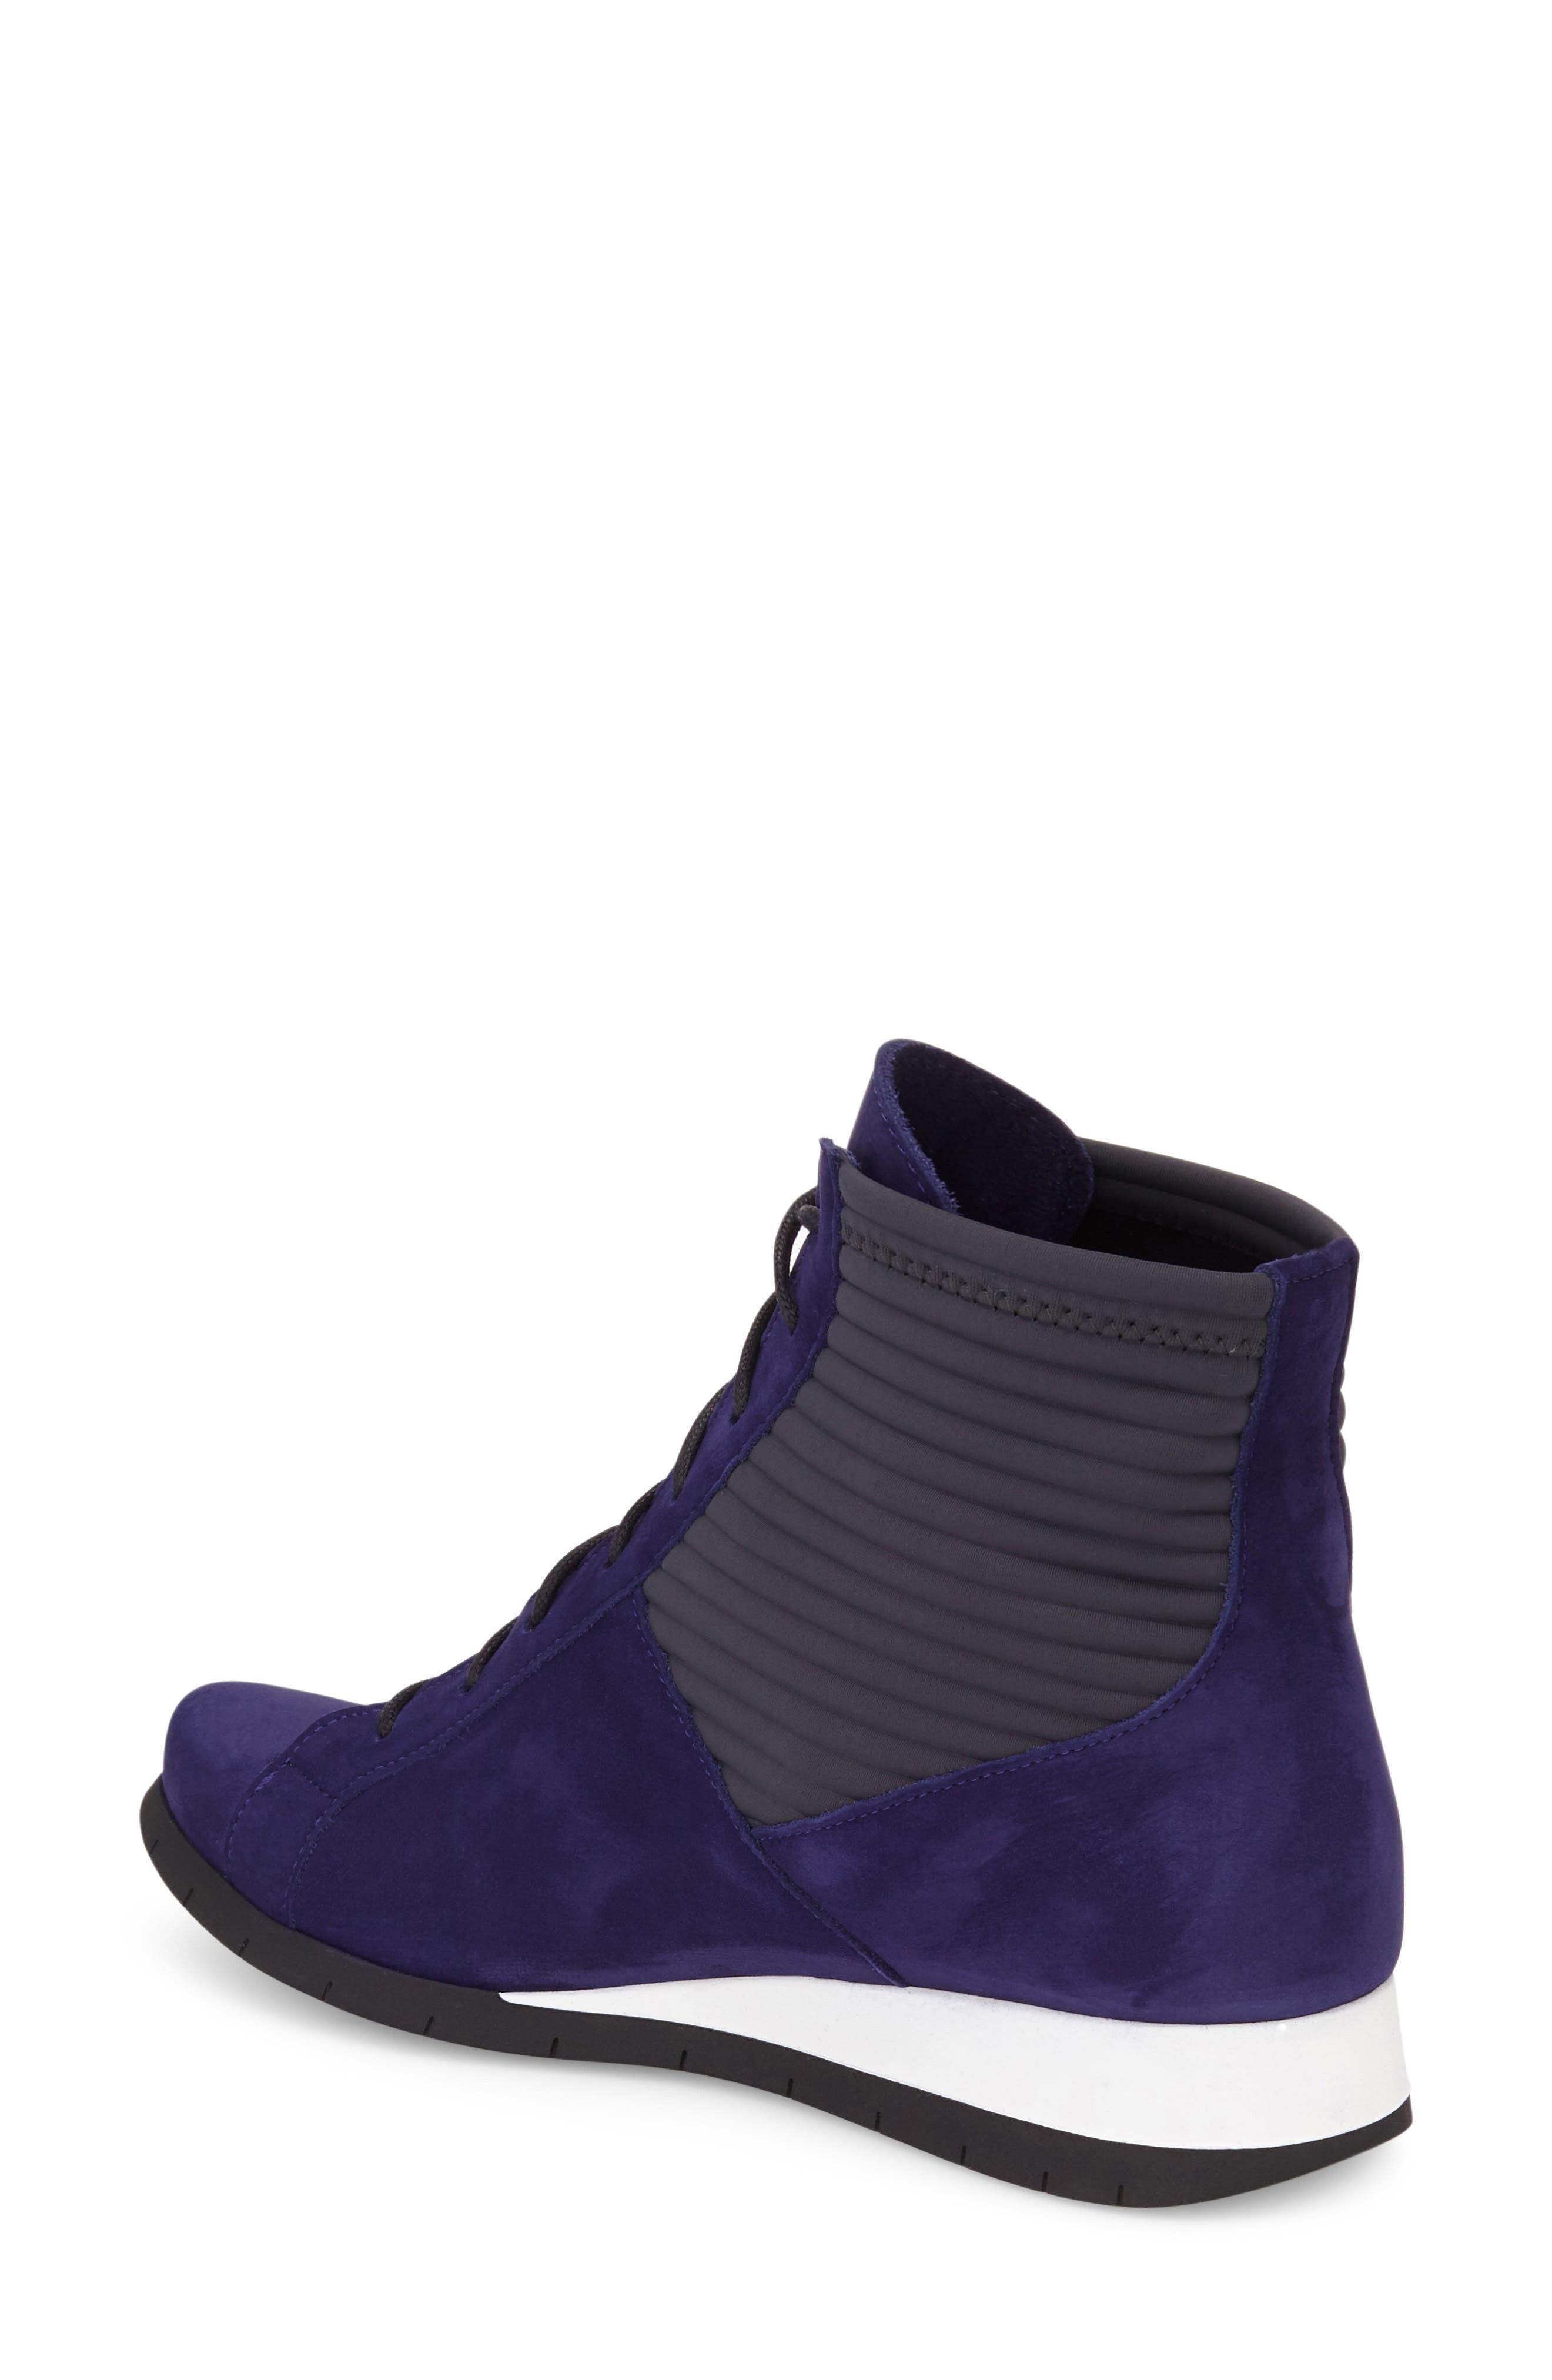 Alternate Image 2  - Arche 'Situ' Wedge High Top Sneaker (Women)